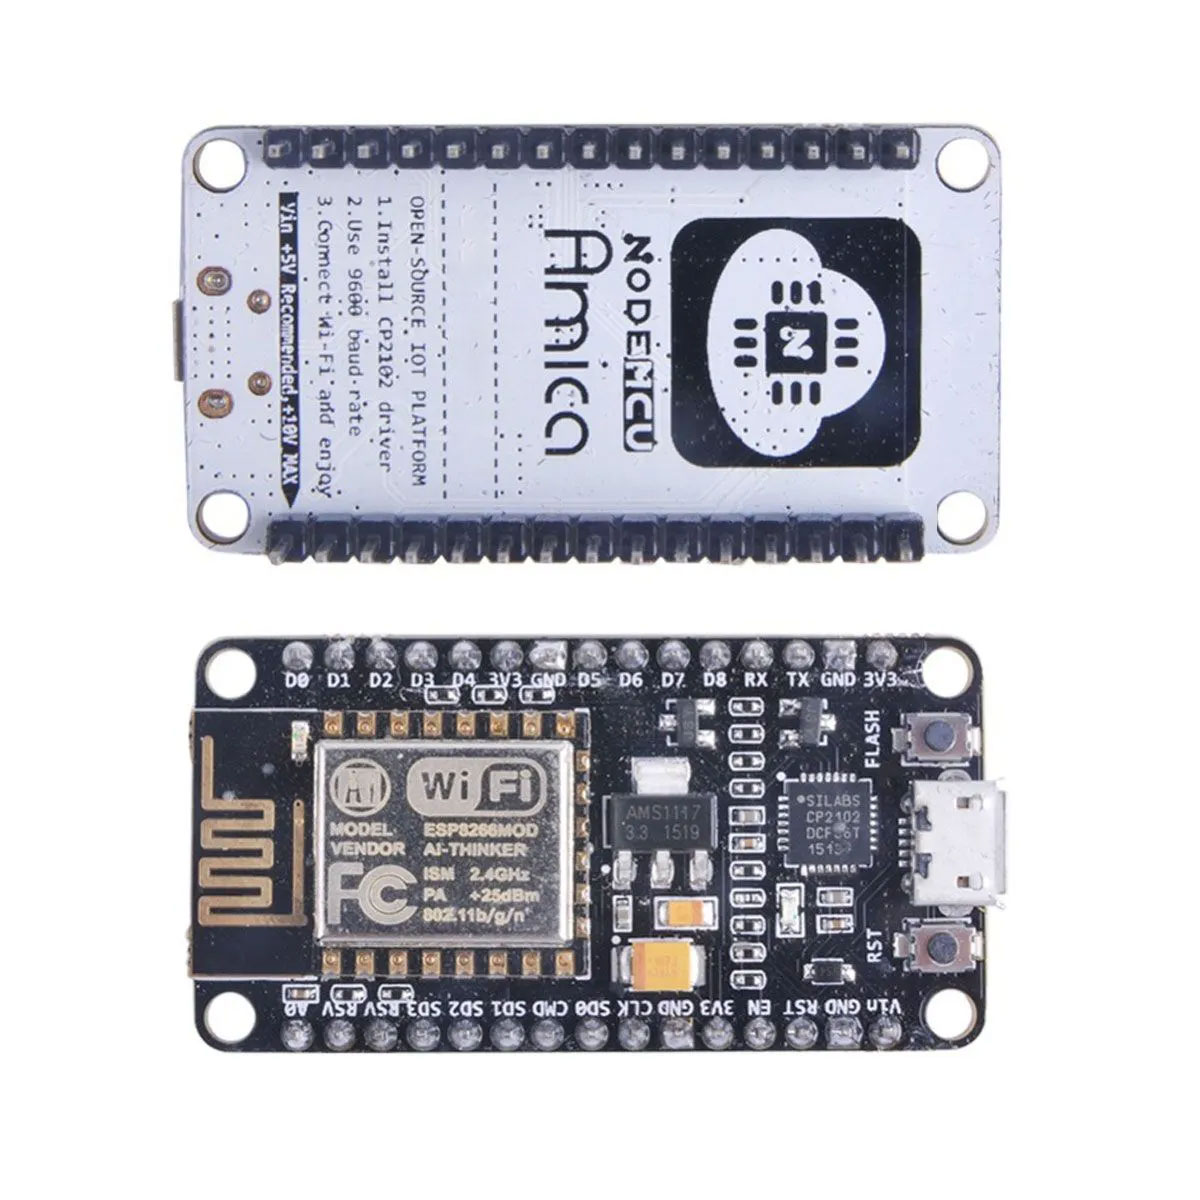 1x Placa ESP-12 NodeMCU V3 Wifi 802.11 B/g/n Esp8266 Esp 12 Amica + Cabo